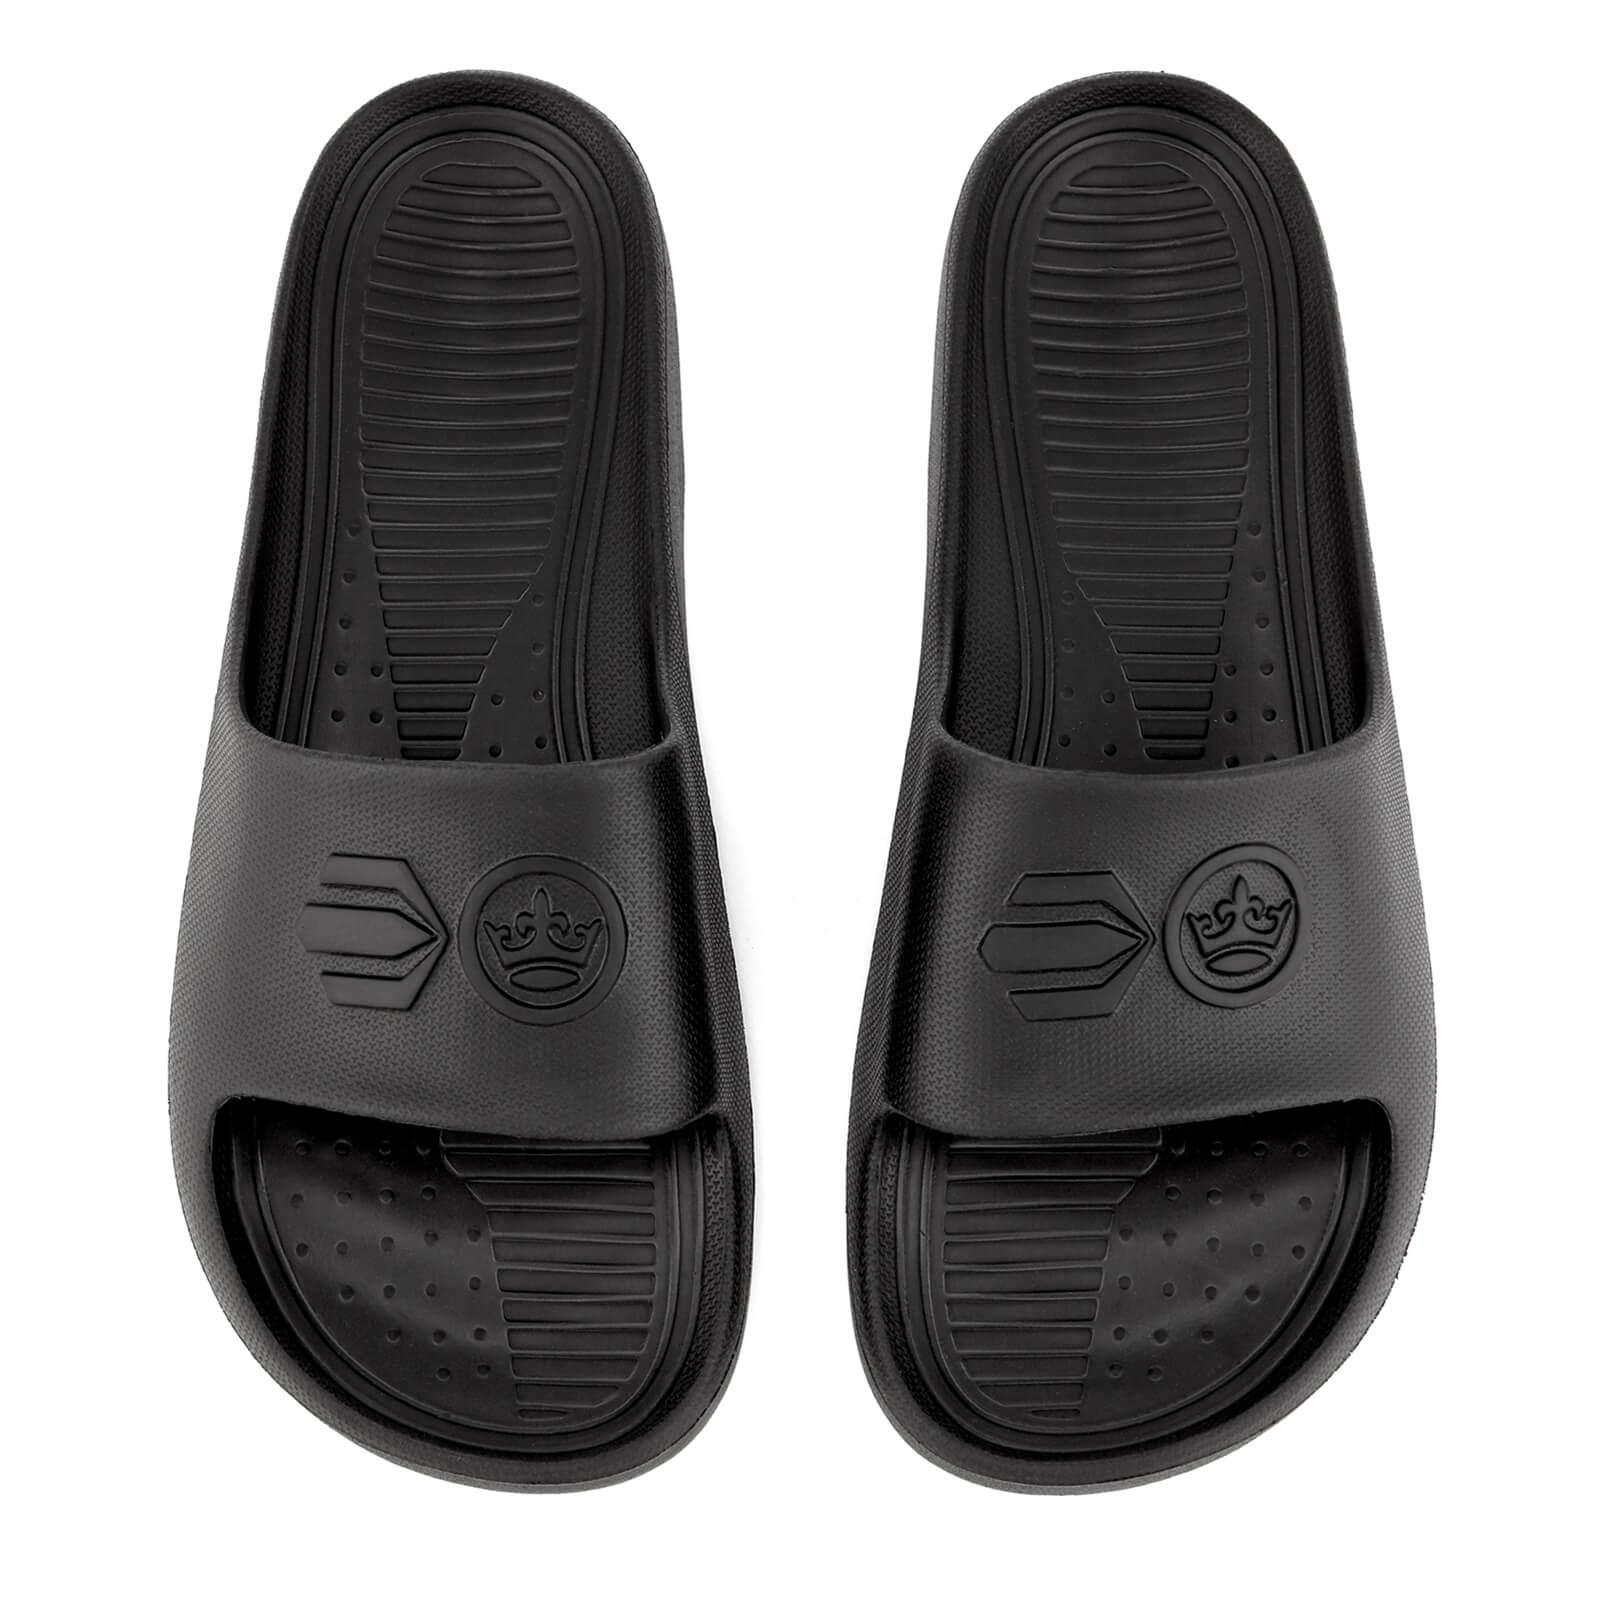 d26279b5c847 Crosshatch Men s Oreti Sliders - Black Mens Footwear